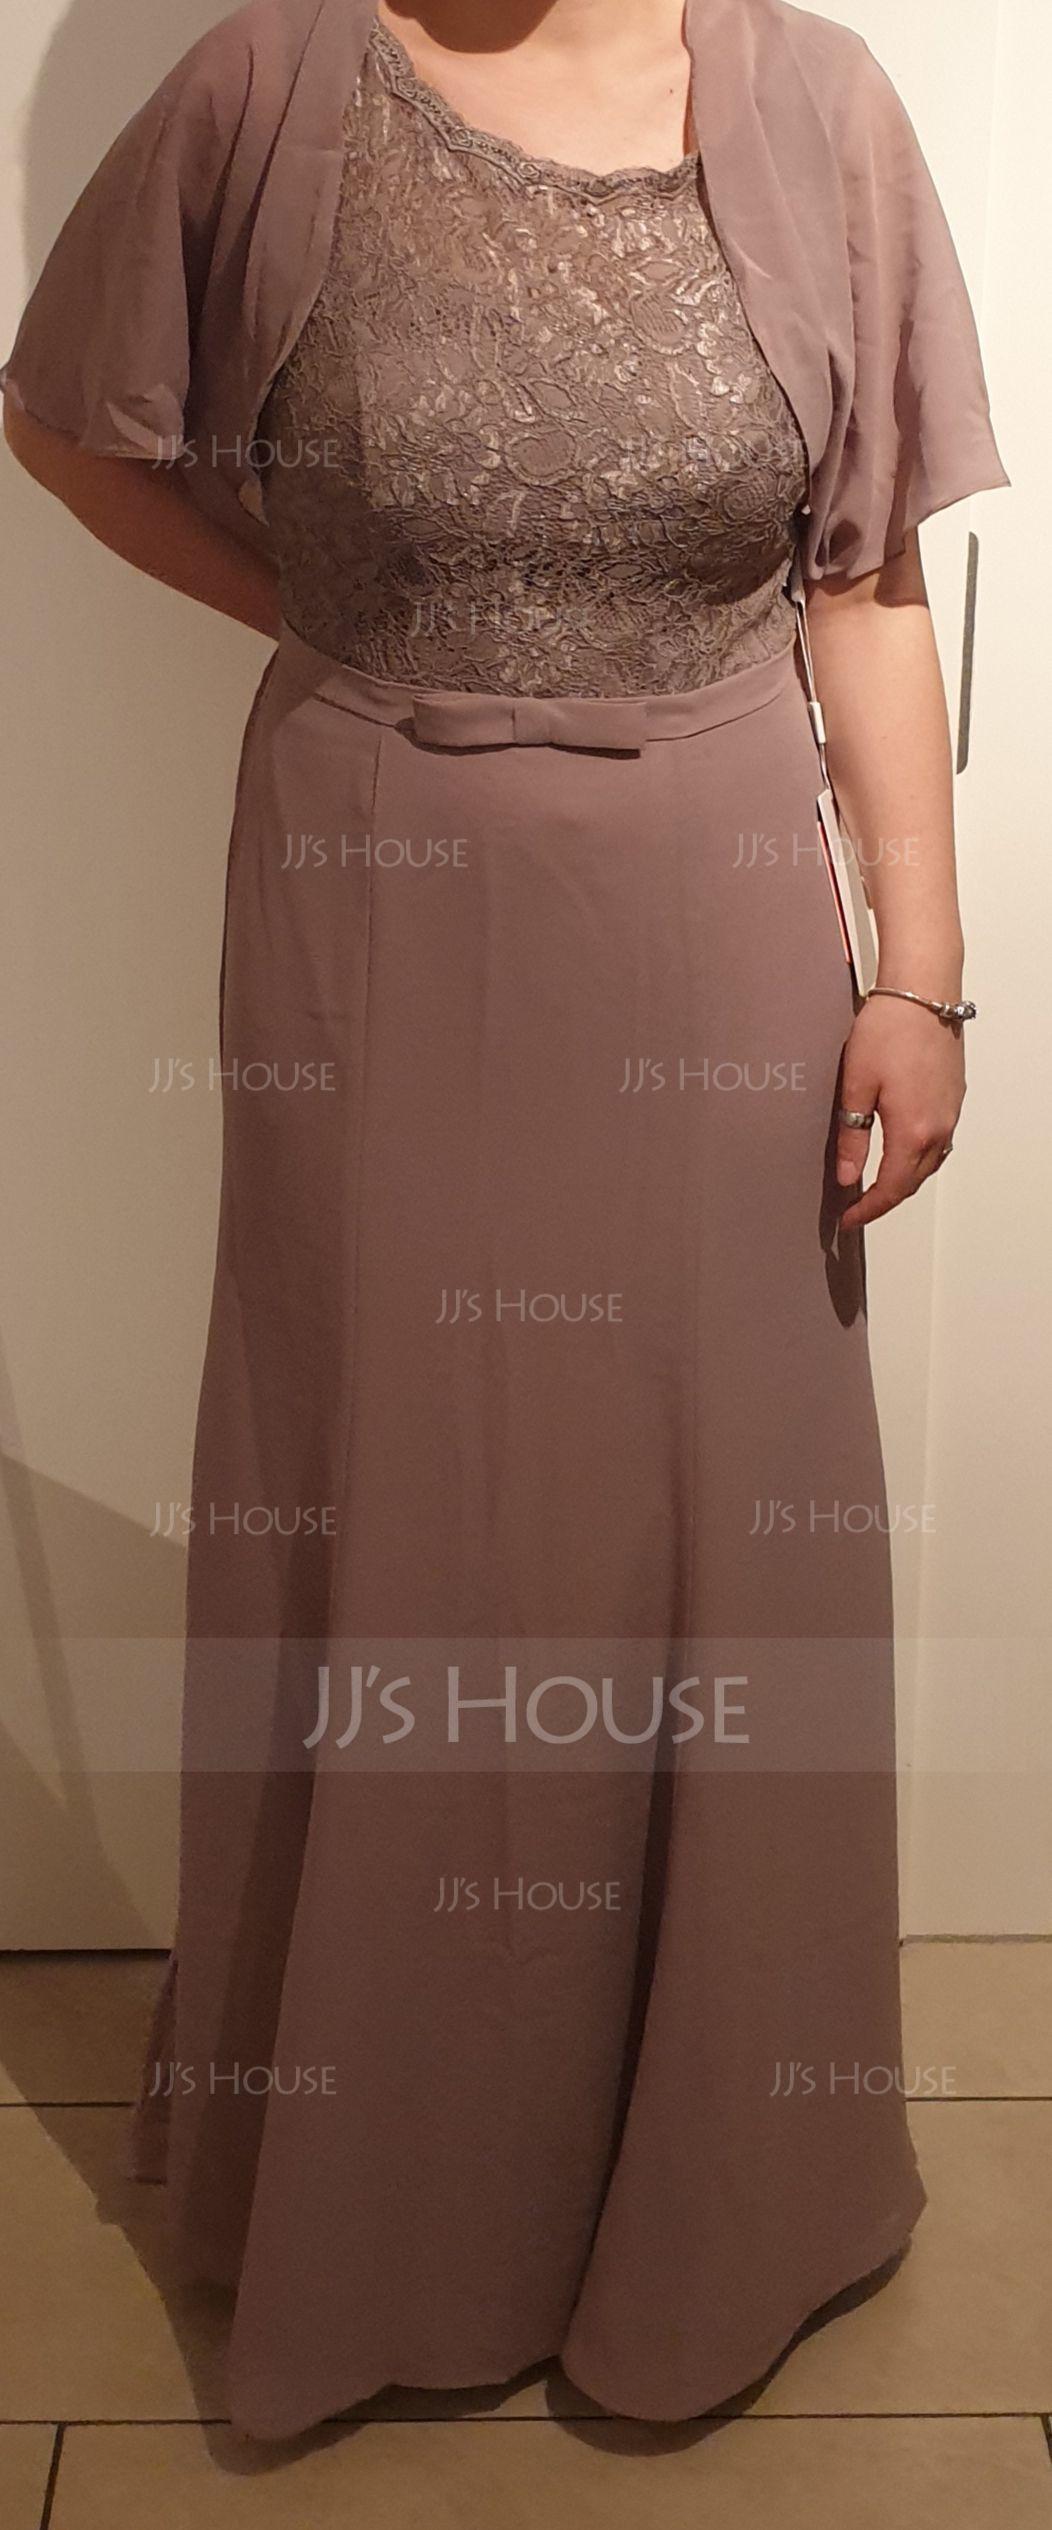 Trumpet/Mermaid Scoop Neck Floor-Length Chiffon Evening Dress With Bow(s) (017112646)